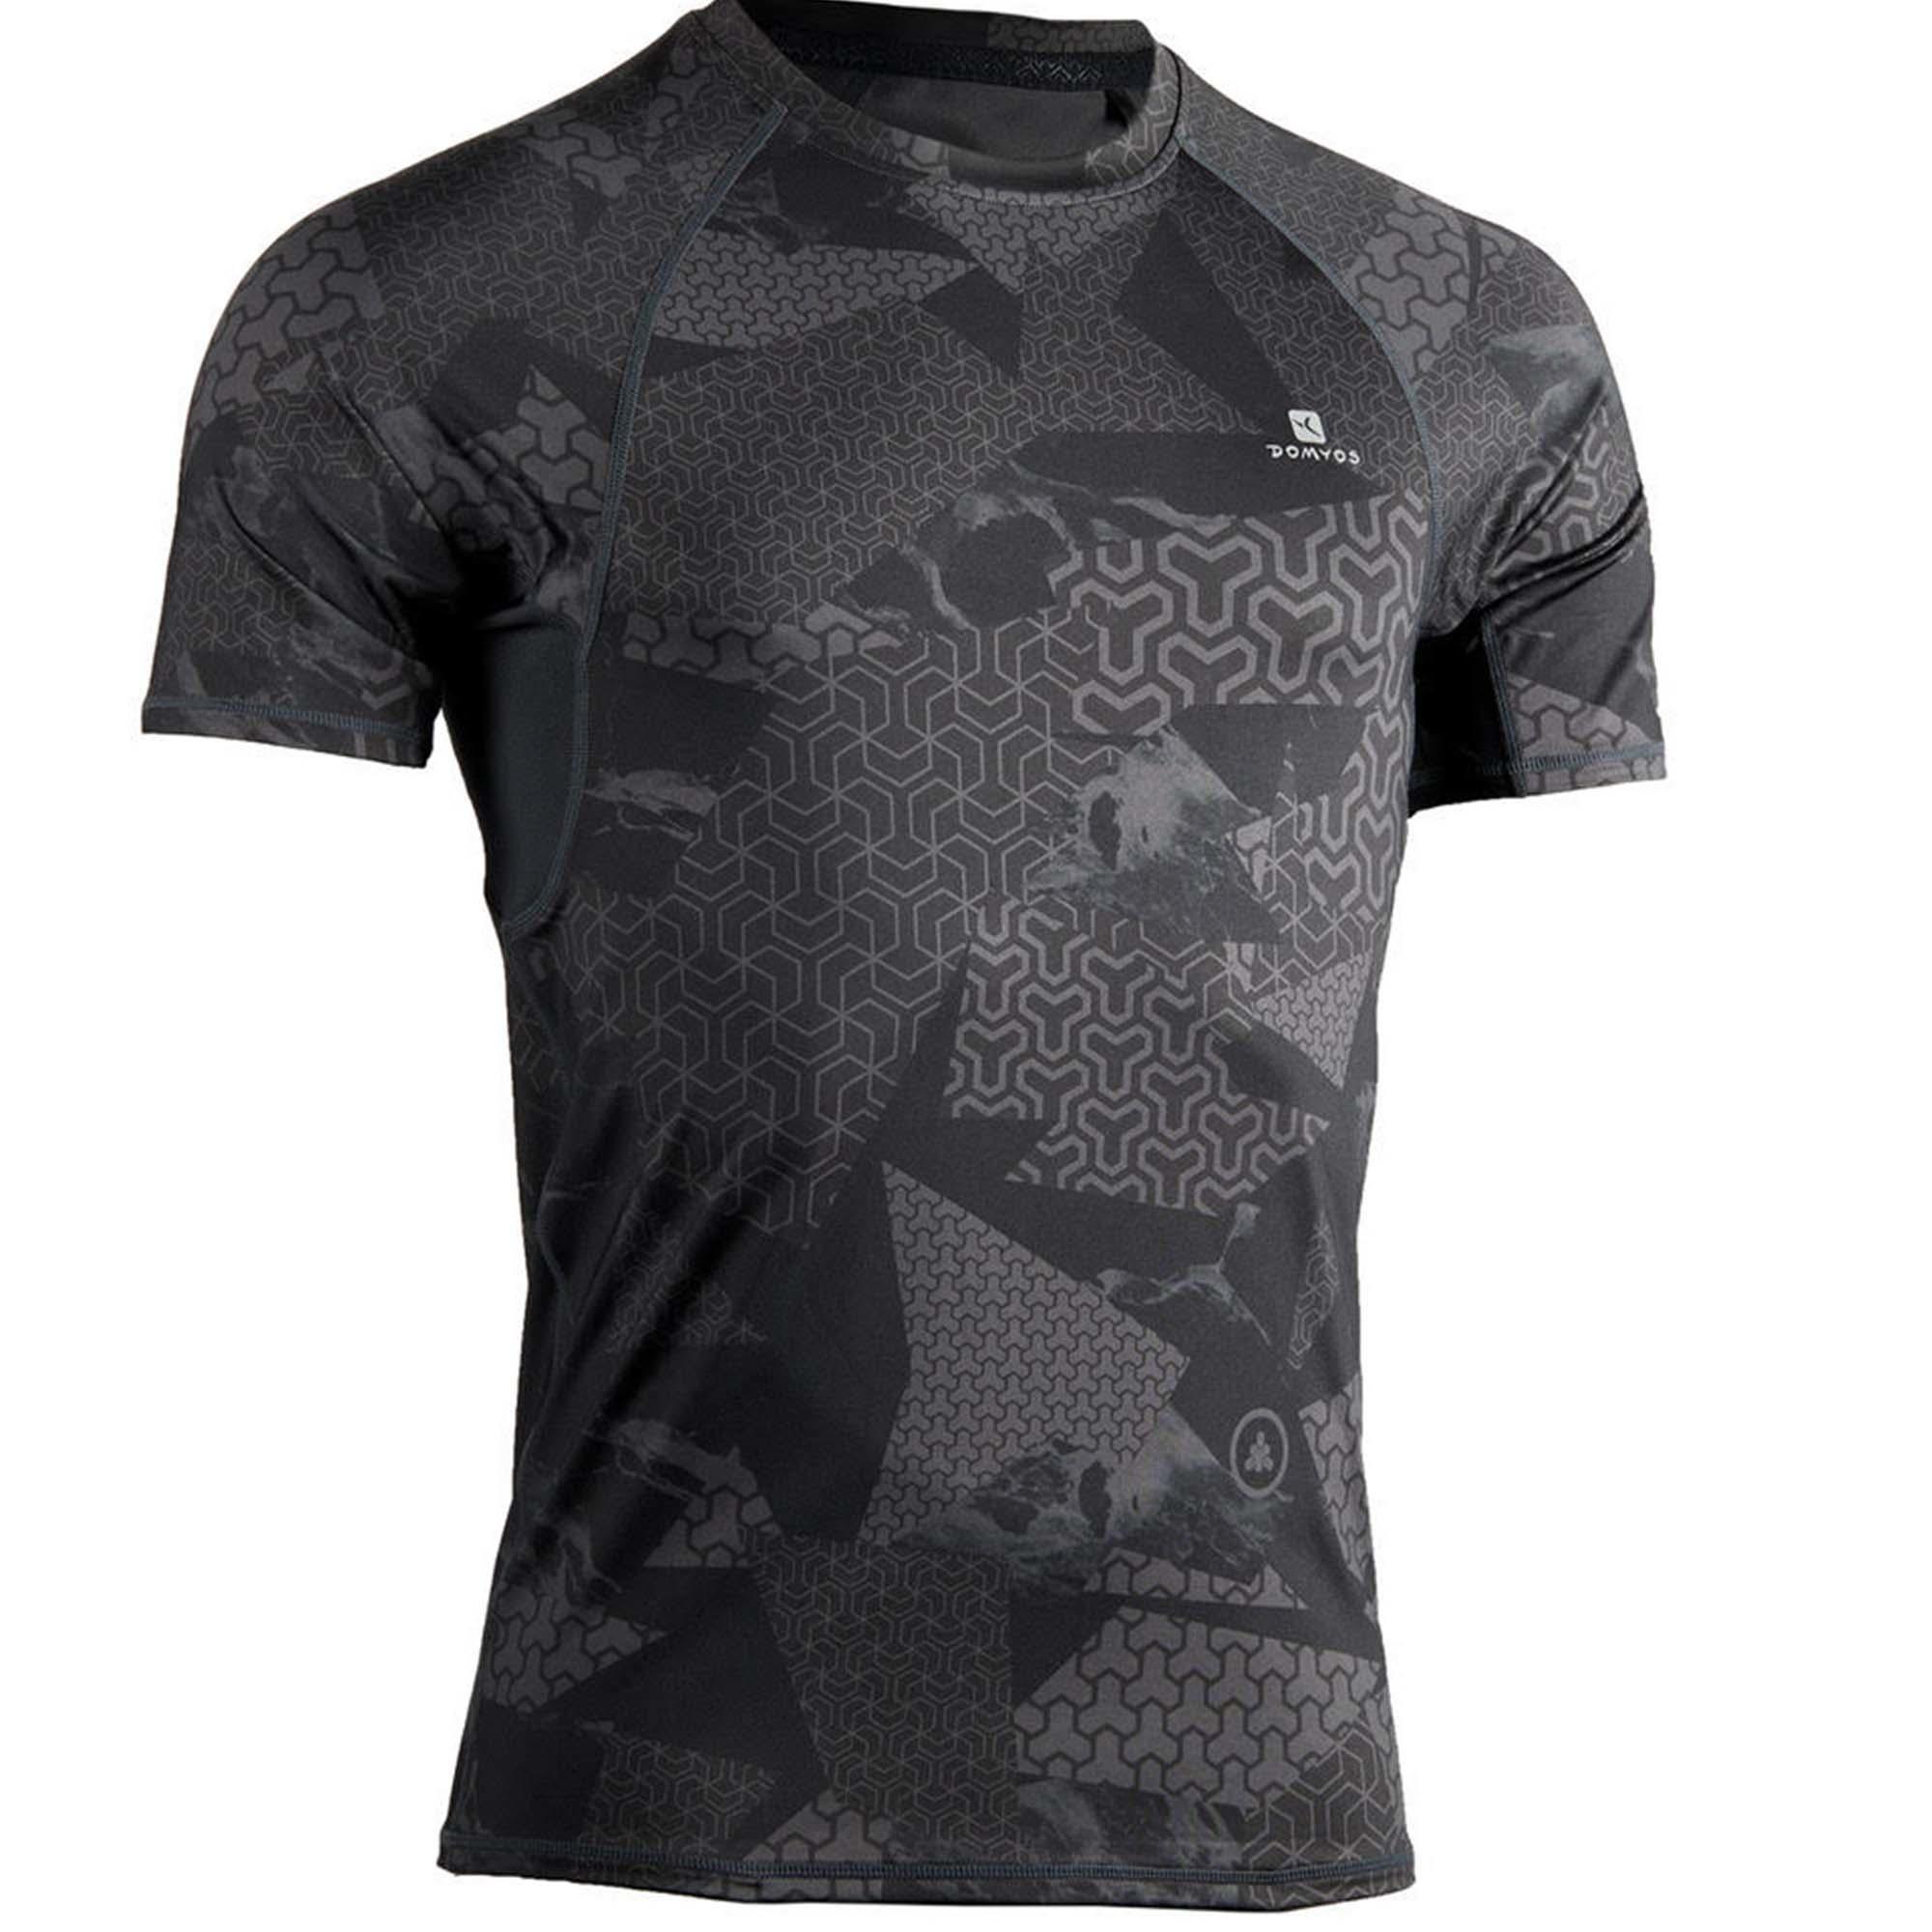 0e7943fb12d28c T-Shirts, Poloshirts Herren | Sport günstig kaufen | DECATHLON